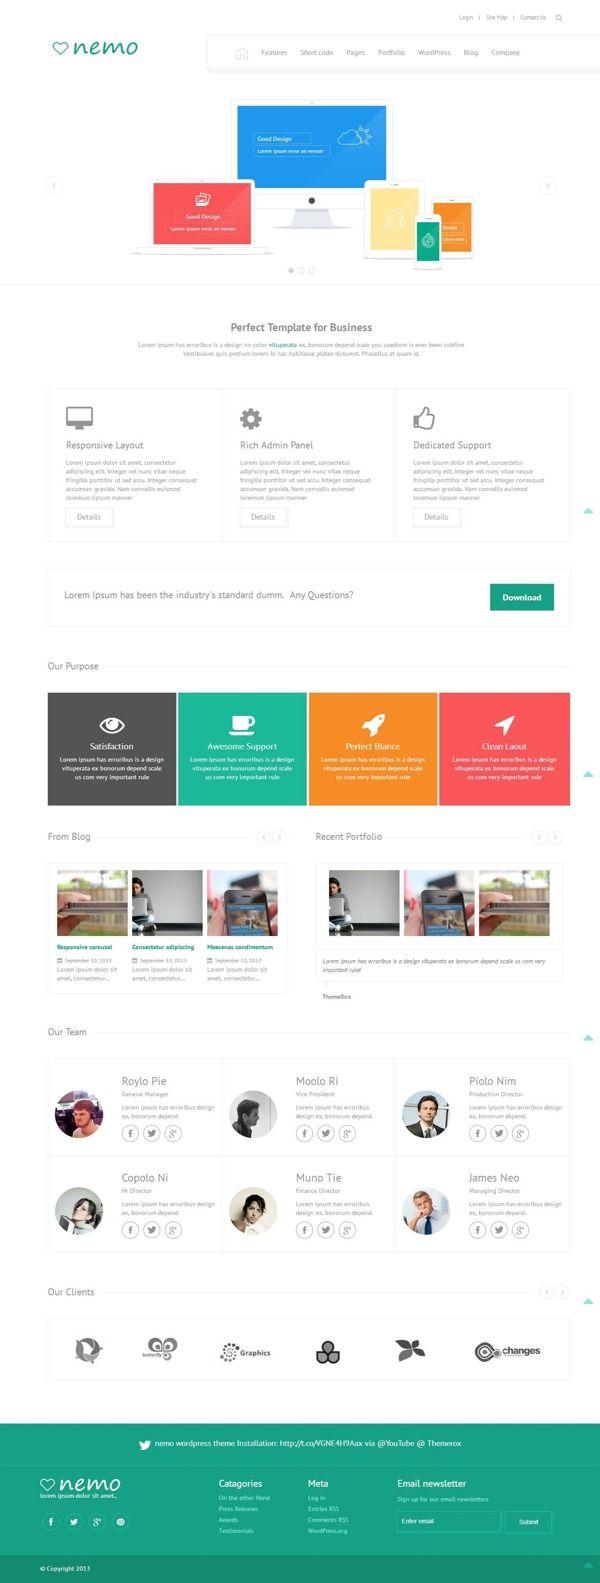 Nemo White Wp Theme On Behance Web Design Web Graphic Design Top Web Designs